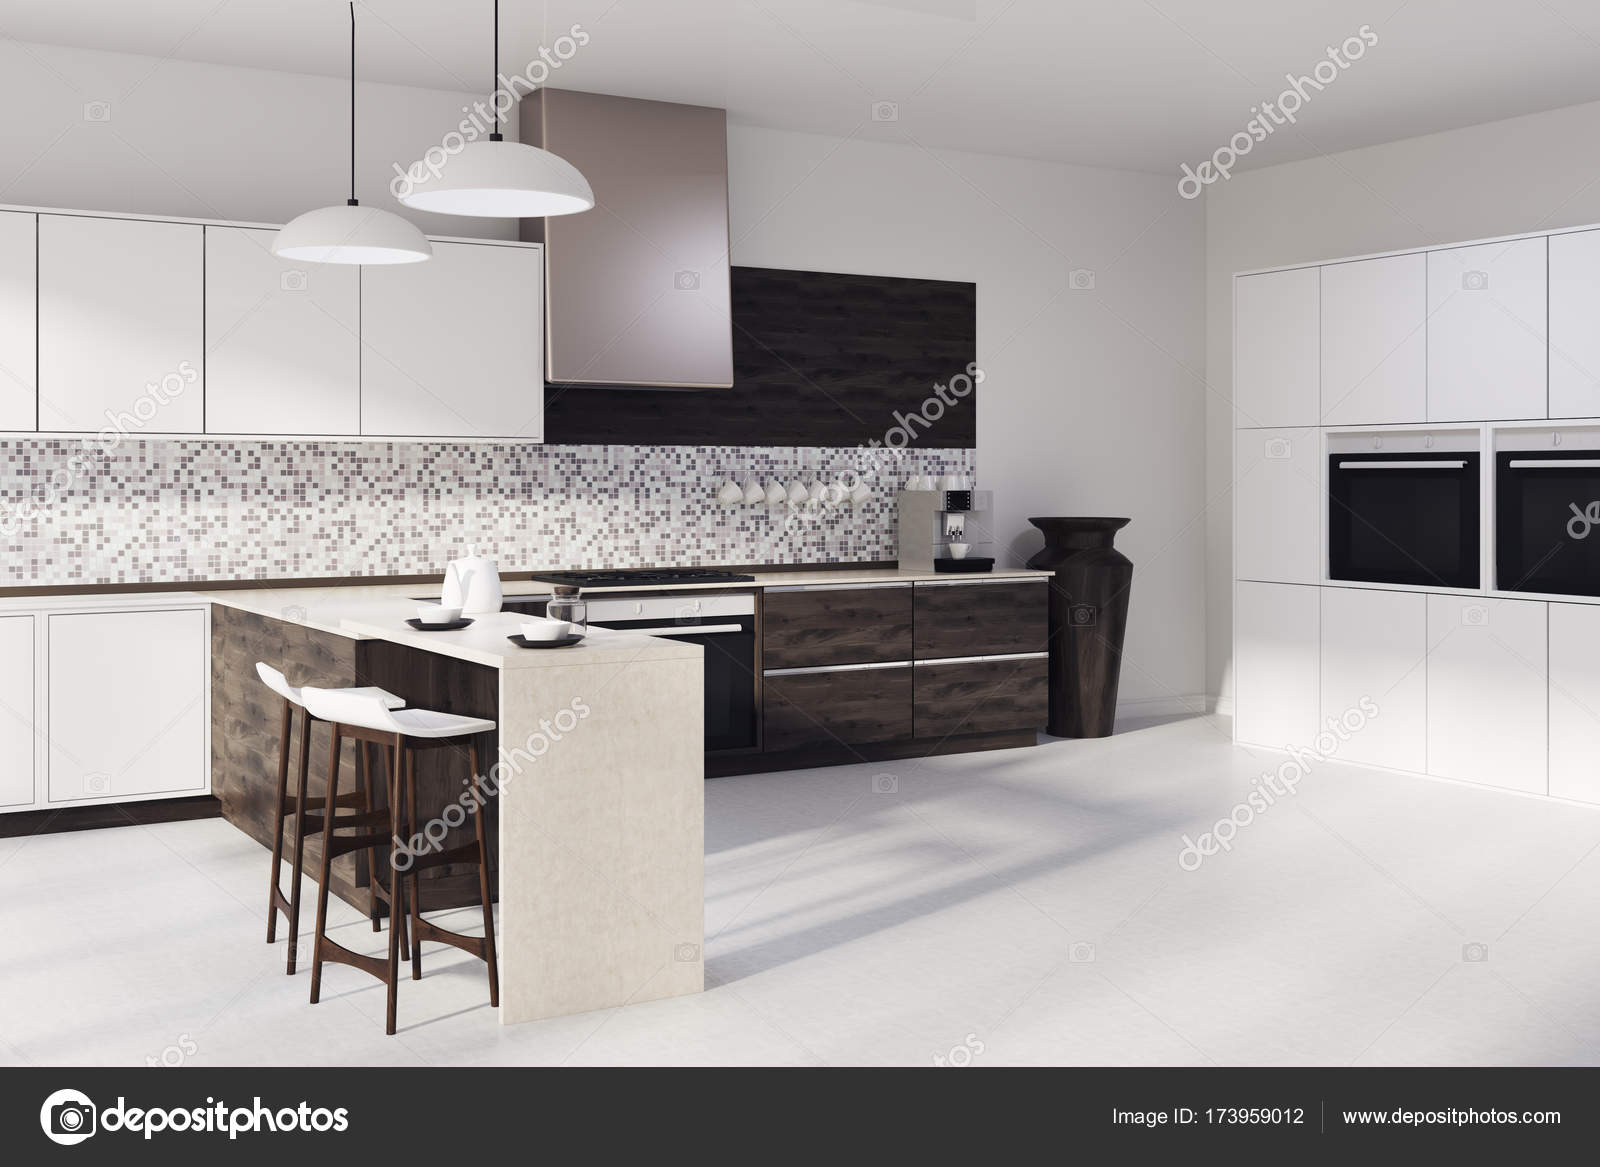 Mosaik Küche, dunklen Holz Arbeitsplatten Seite — Stockfoto ...